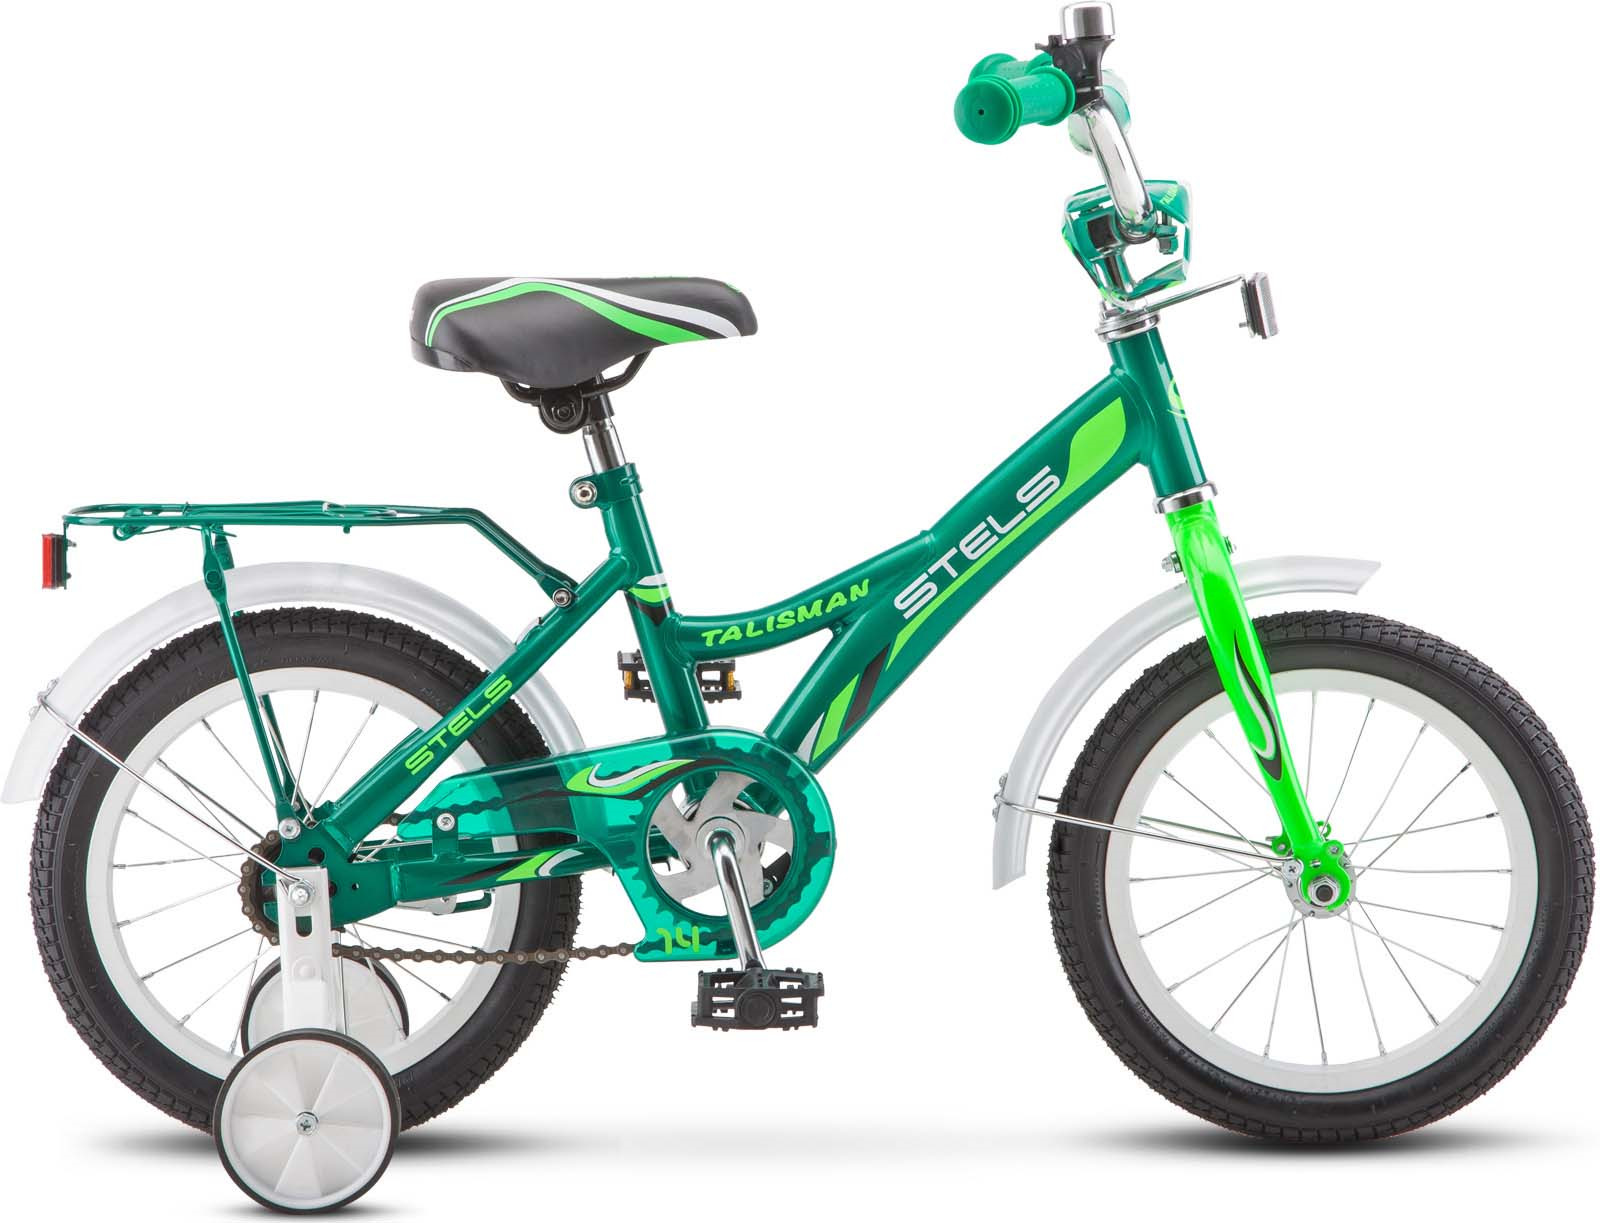 Велосипед Stels Talisman 12, JU000133052017, зеленый